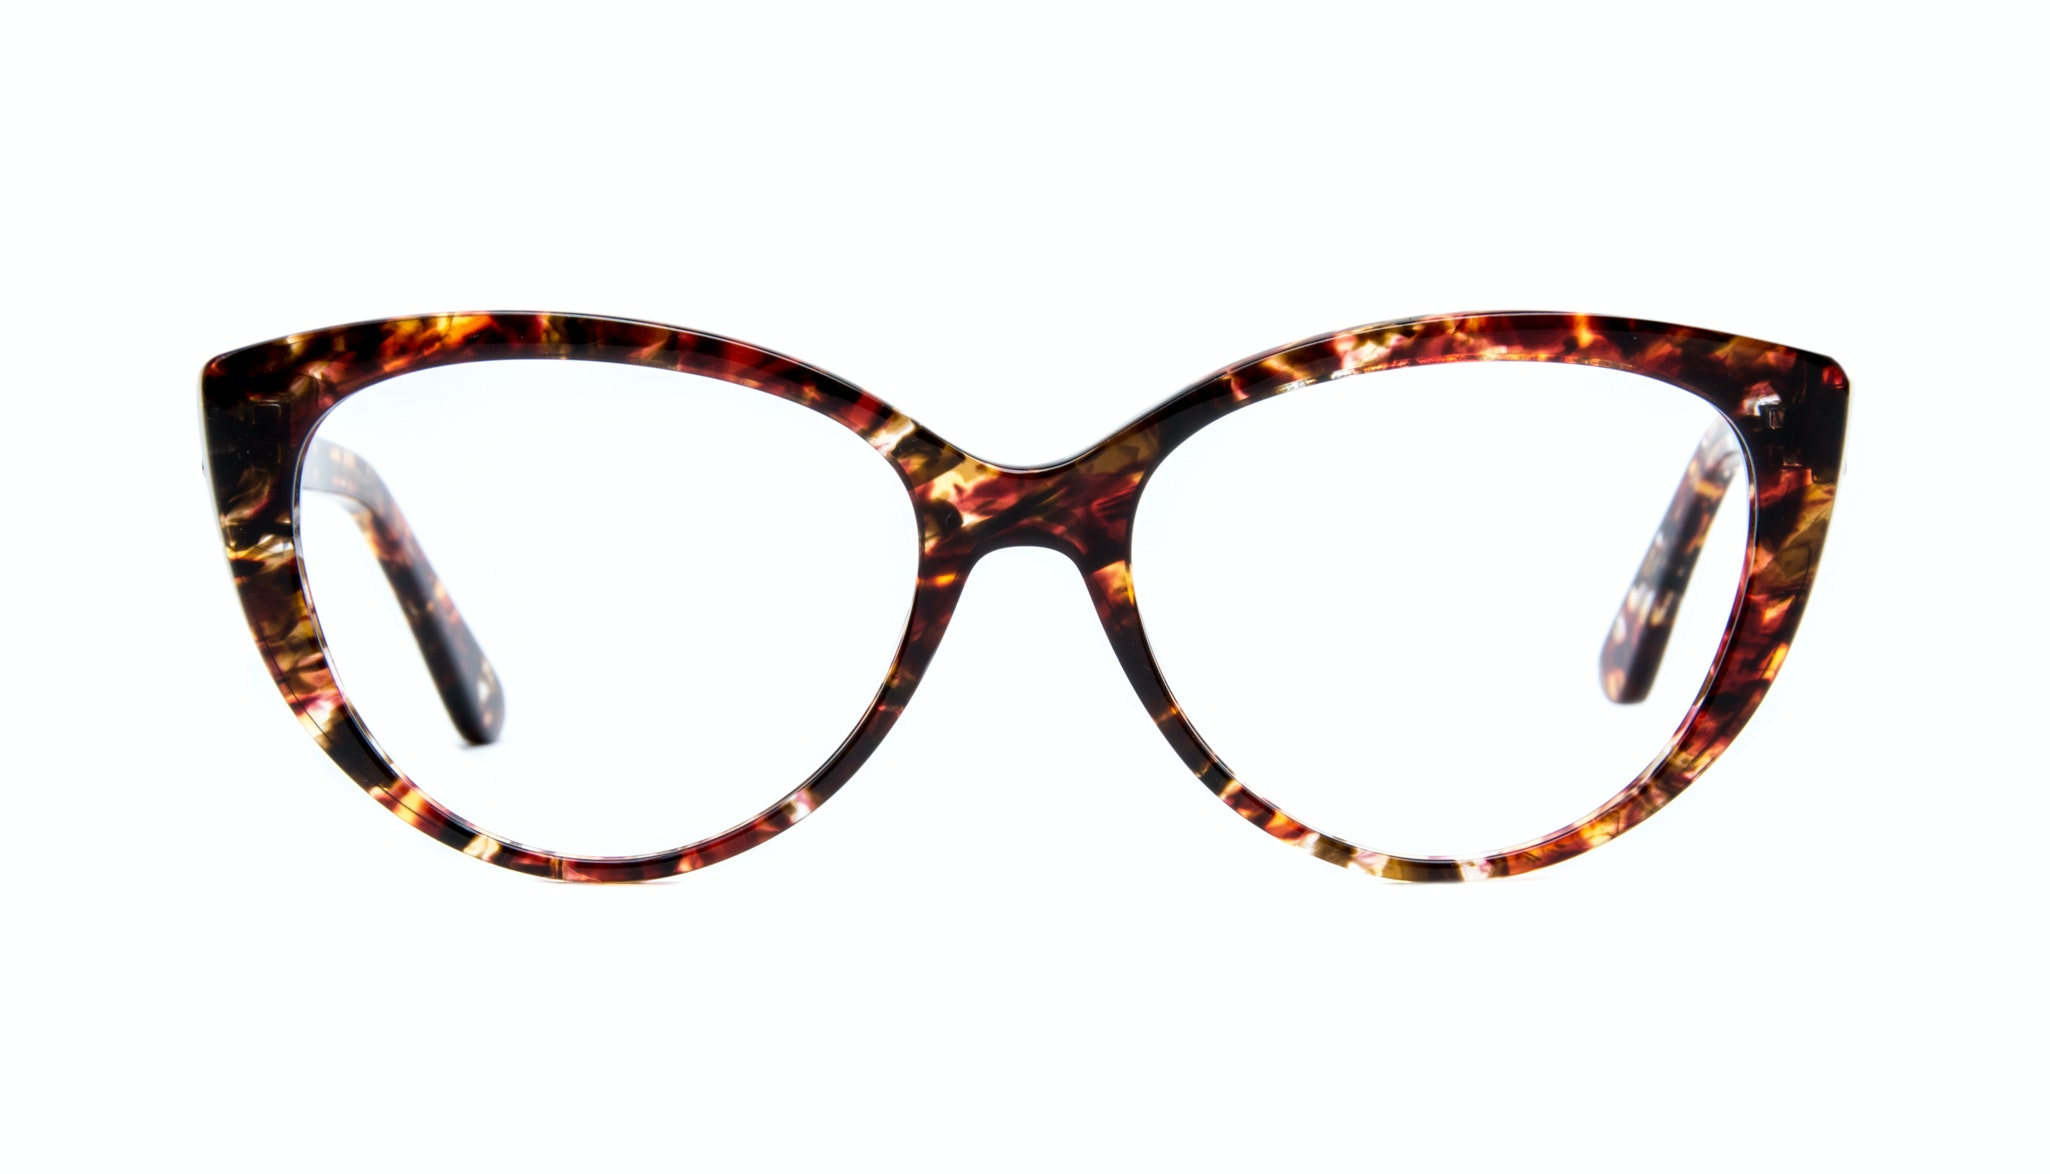 Affordable Fashion Glasses Cat Eye Eyeglasses Women Bliss lava Front